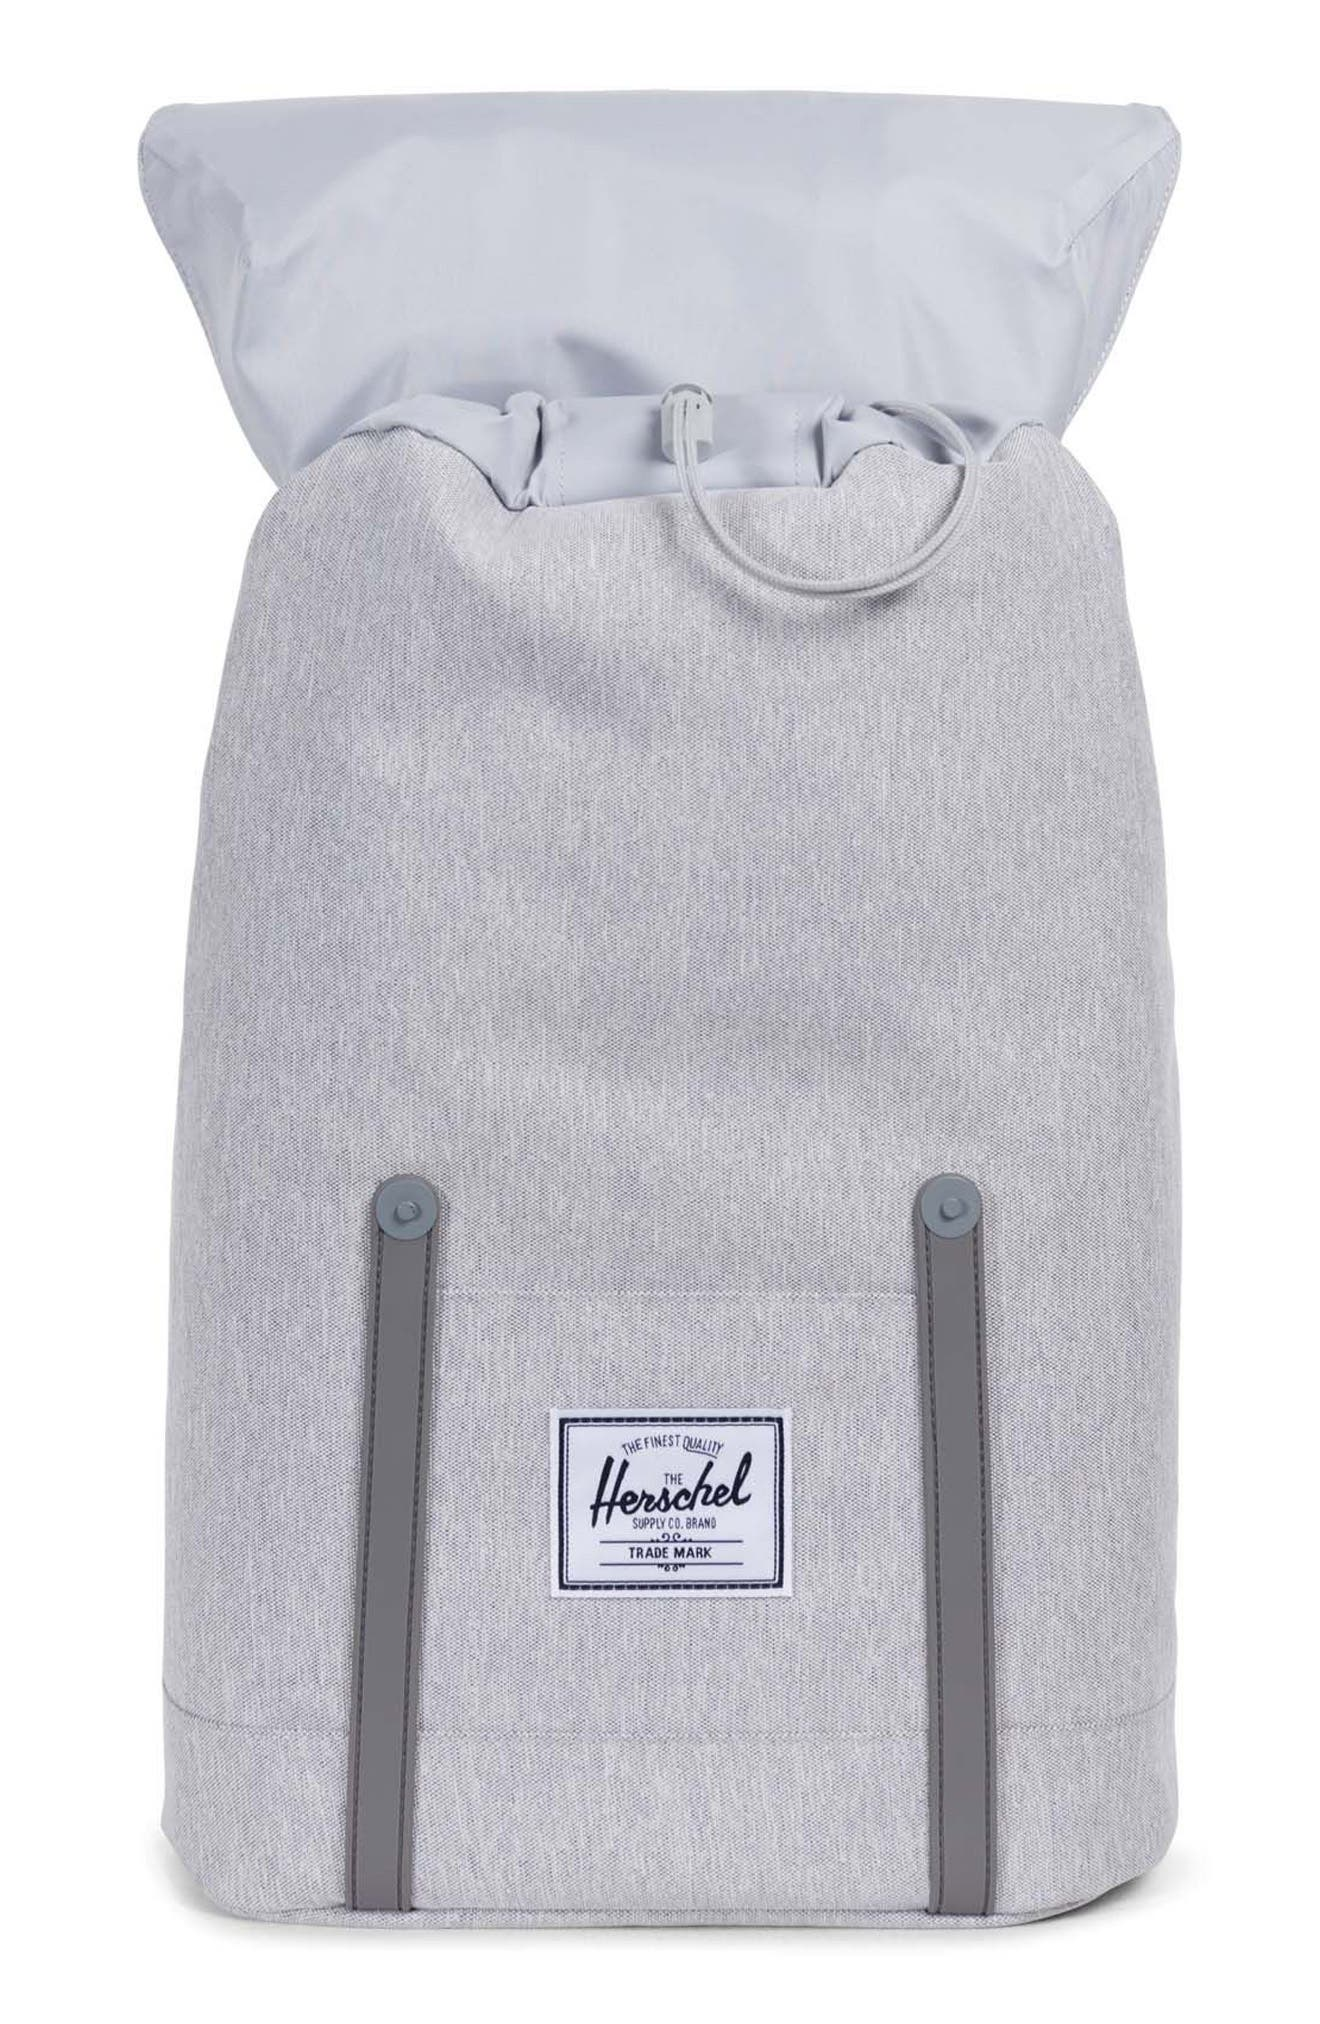 'Retreat' Backpack,                             Alternate thumbnail 3, color,                             Light Grey Crosshatch/ White